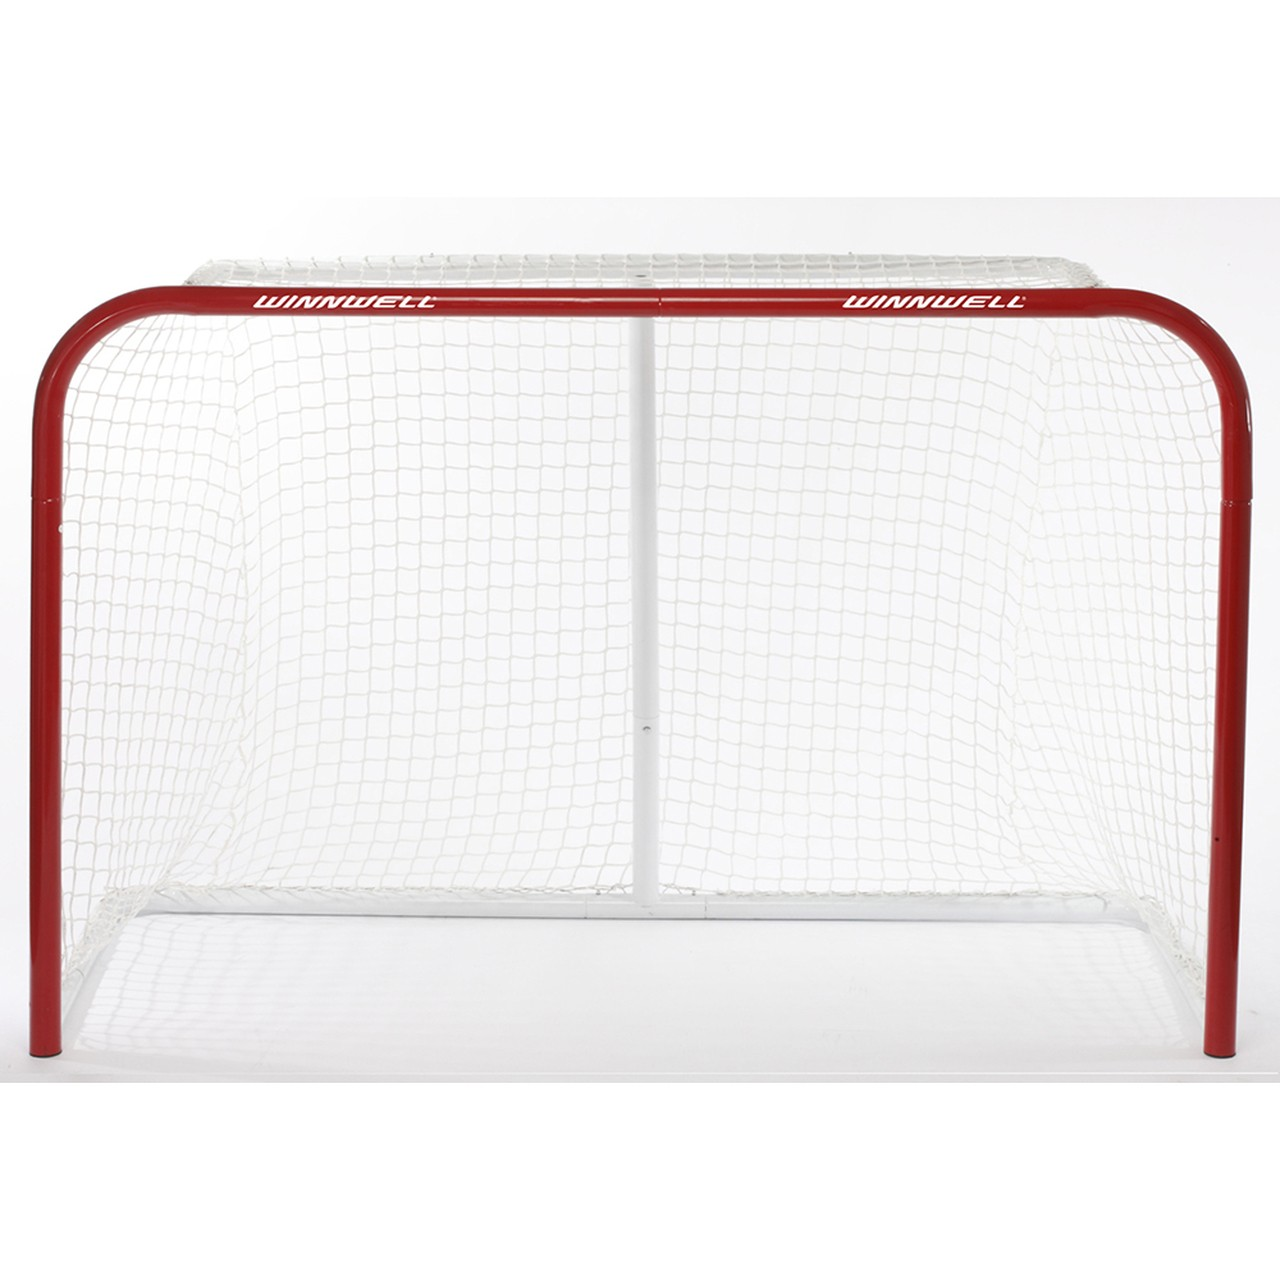 WINNWELL Pro Steel Regulation Хоккейная Ворота